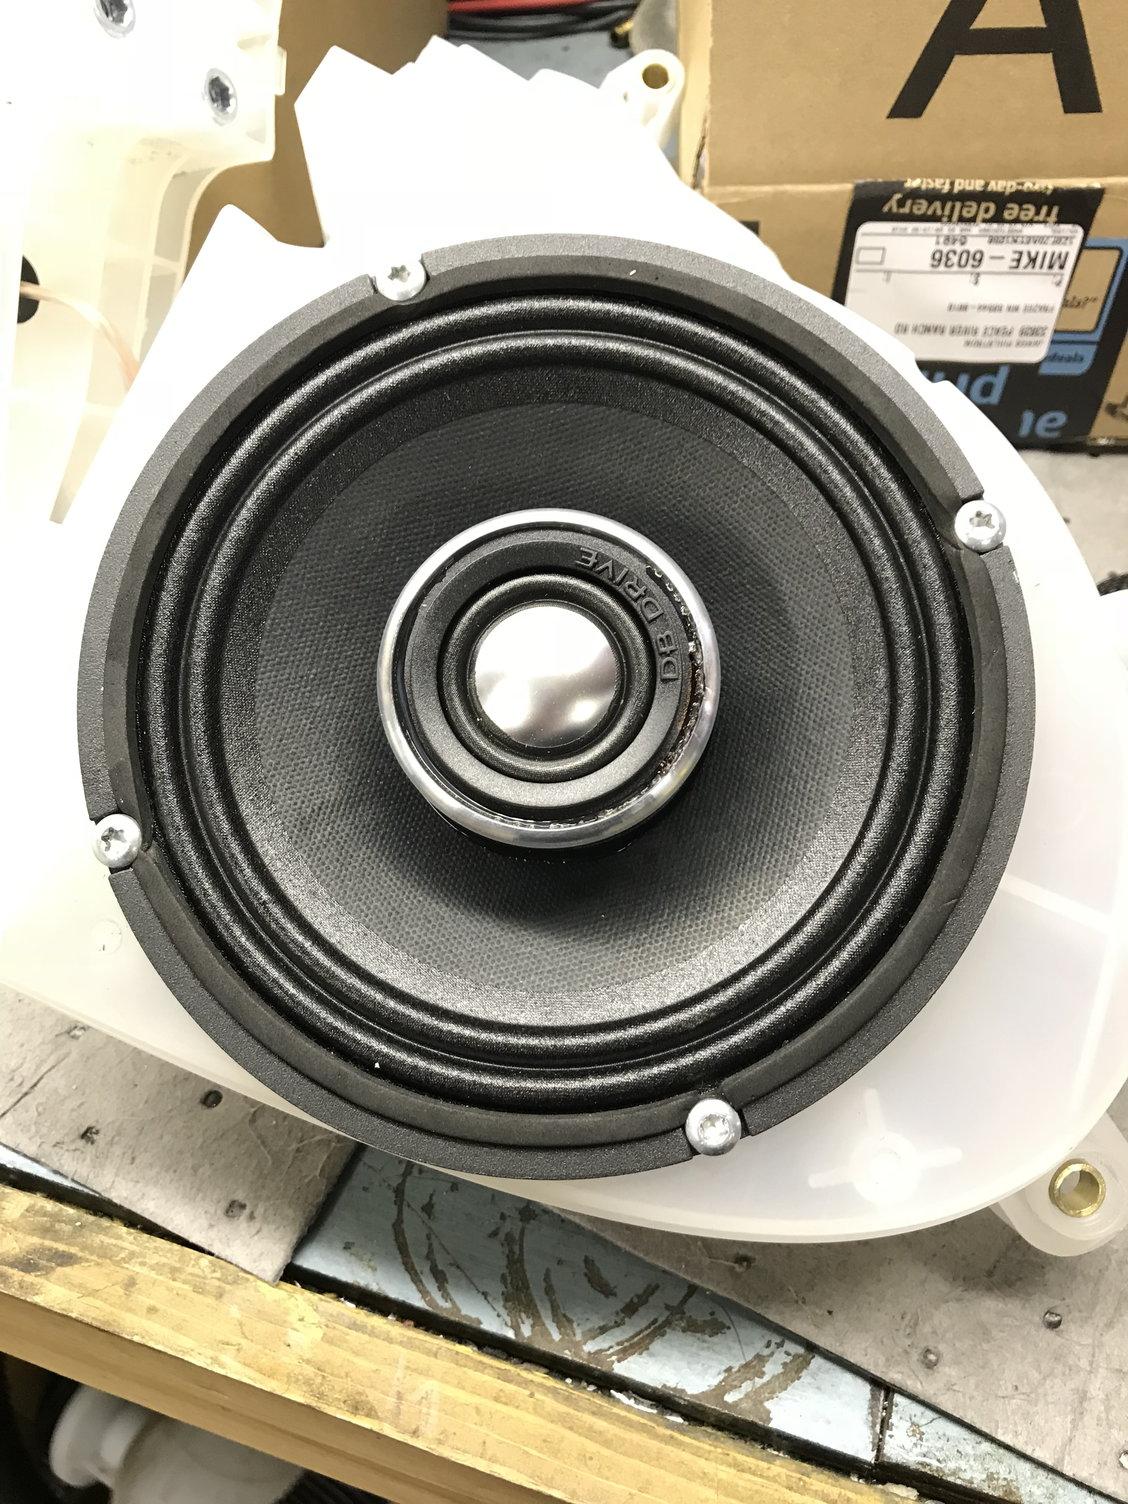 WDX6MOTO speakers & RFosgate TM400XAD - Page 2 - Harley Davidson Forums